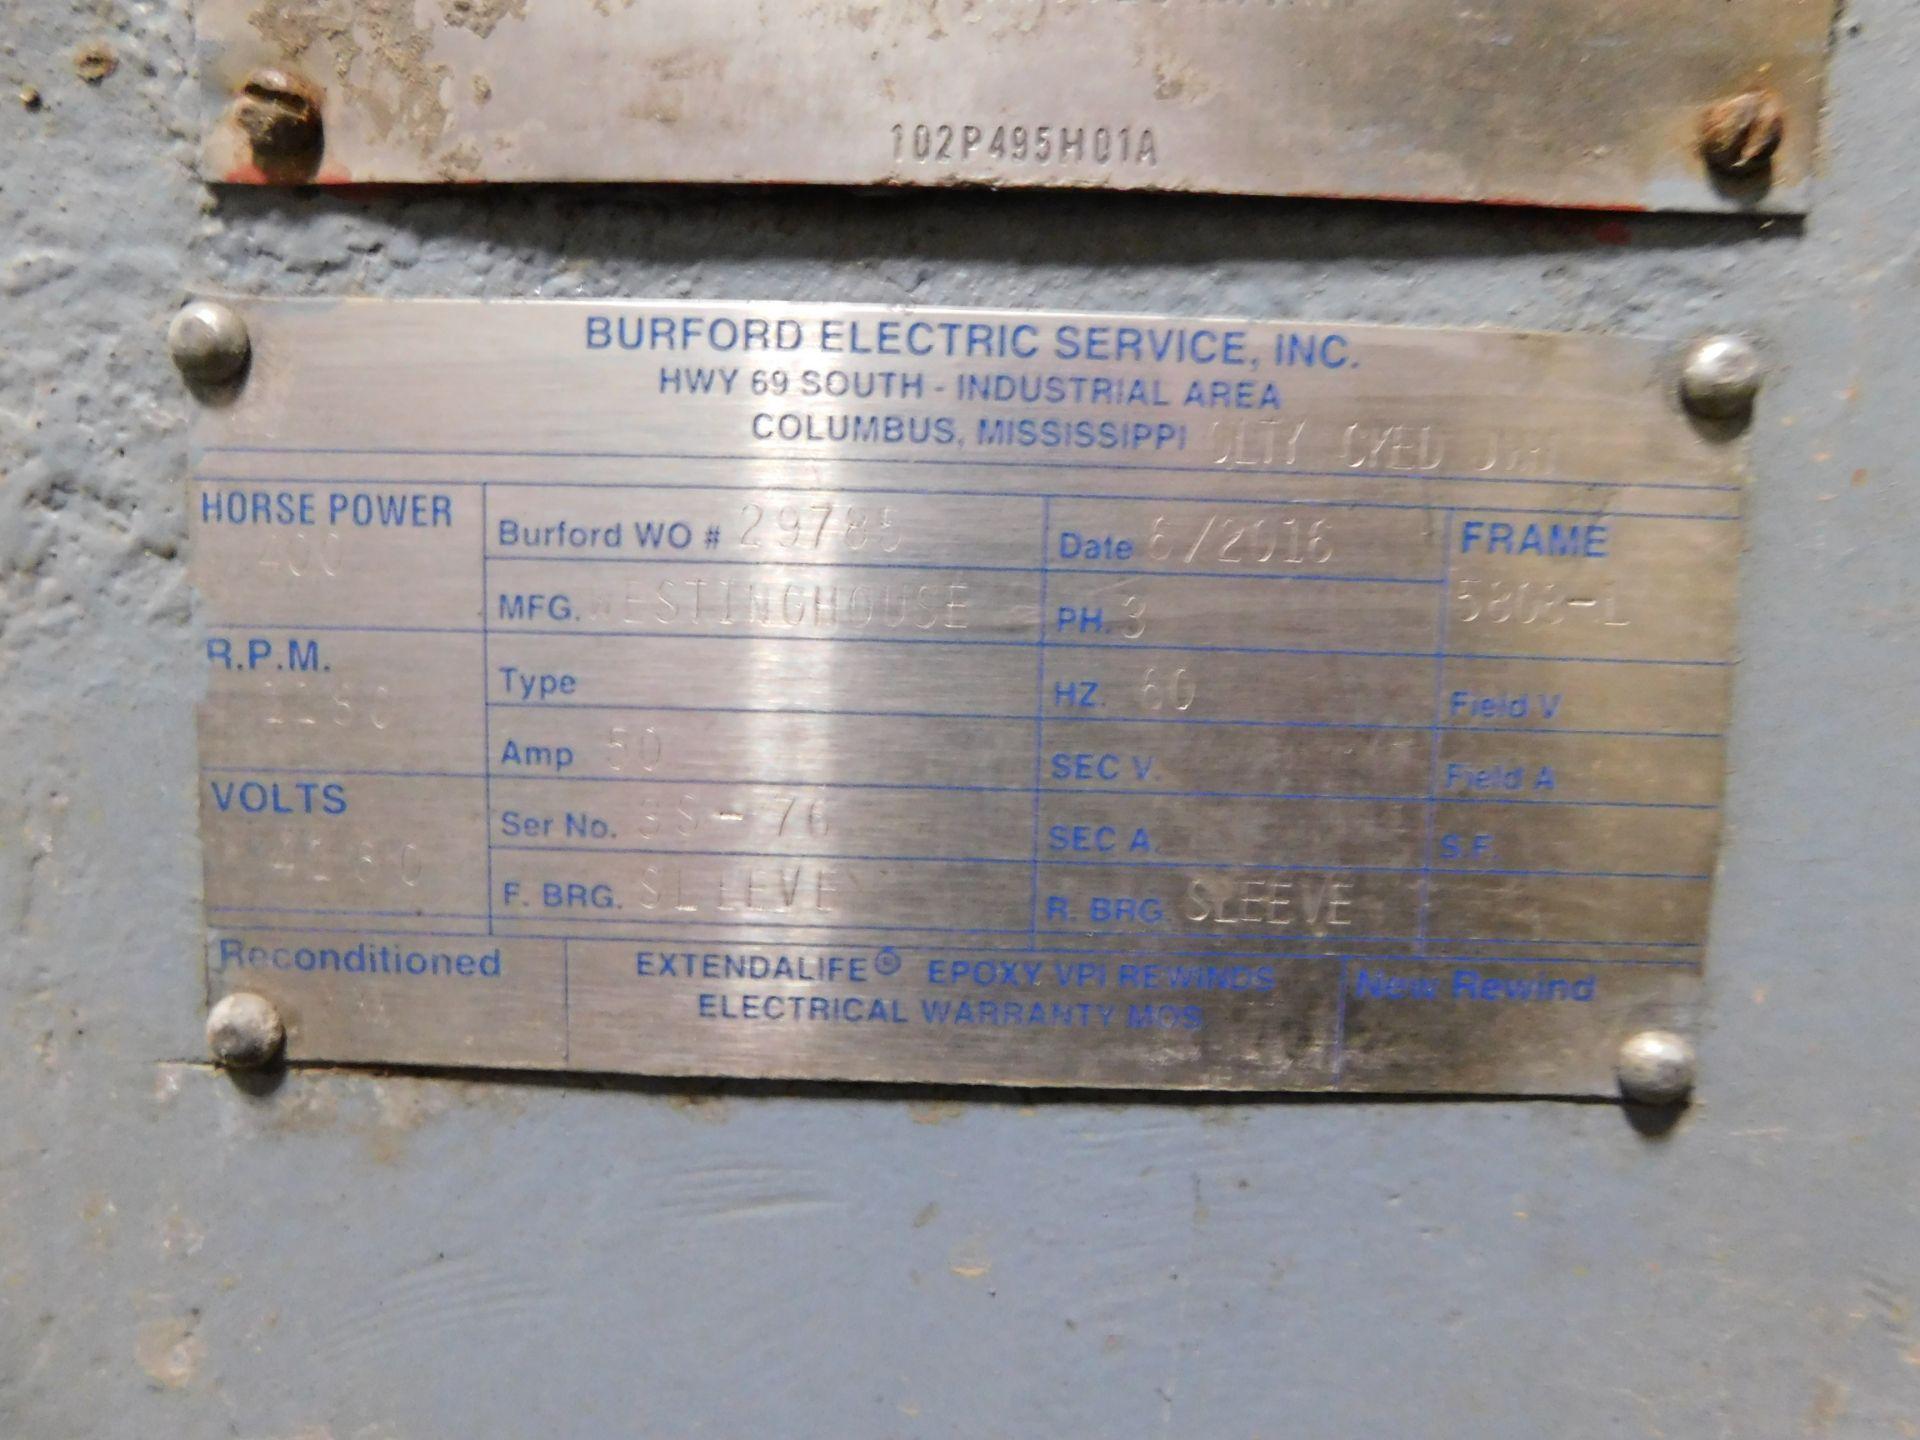 Teco Westinghouse Motor. 400 HP. 3 Ph. 1180 RPM. 4000 V. 60 Hz. 5808L. HSW1. - Image 6 of 7